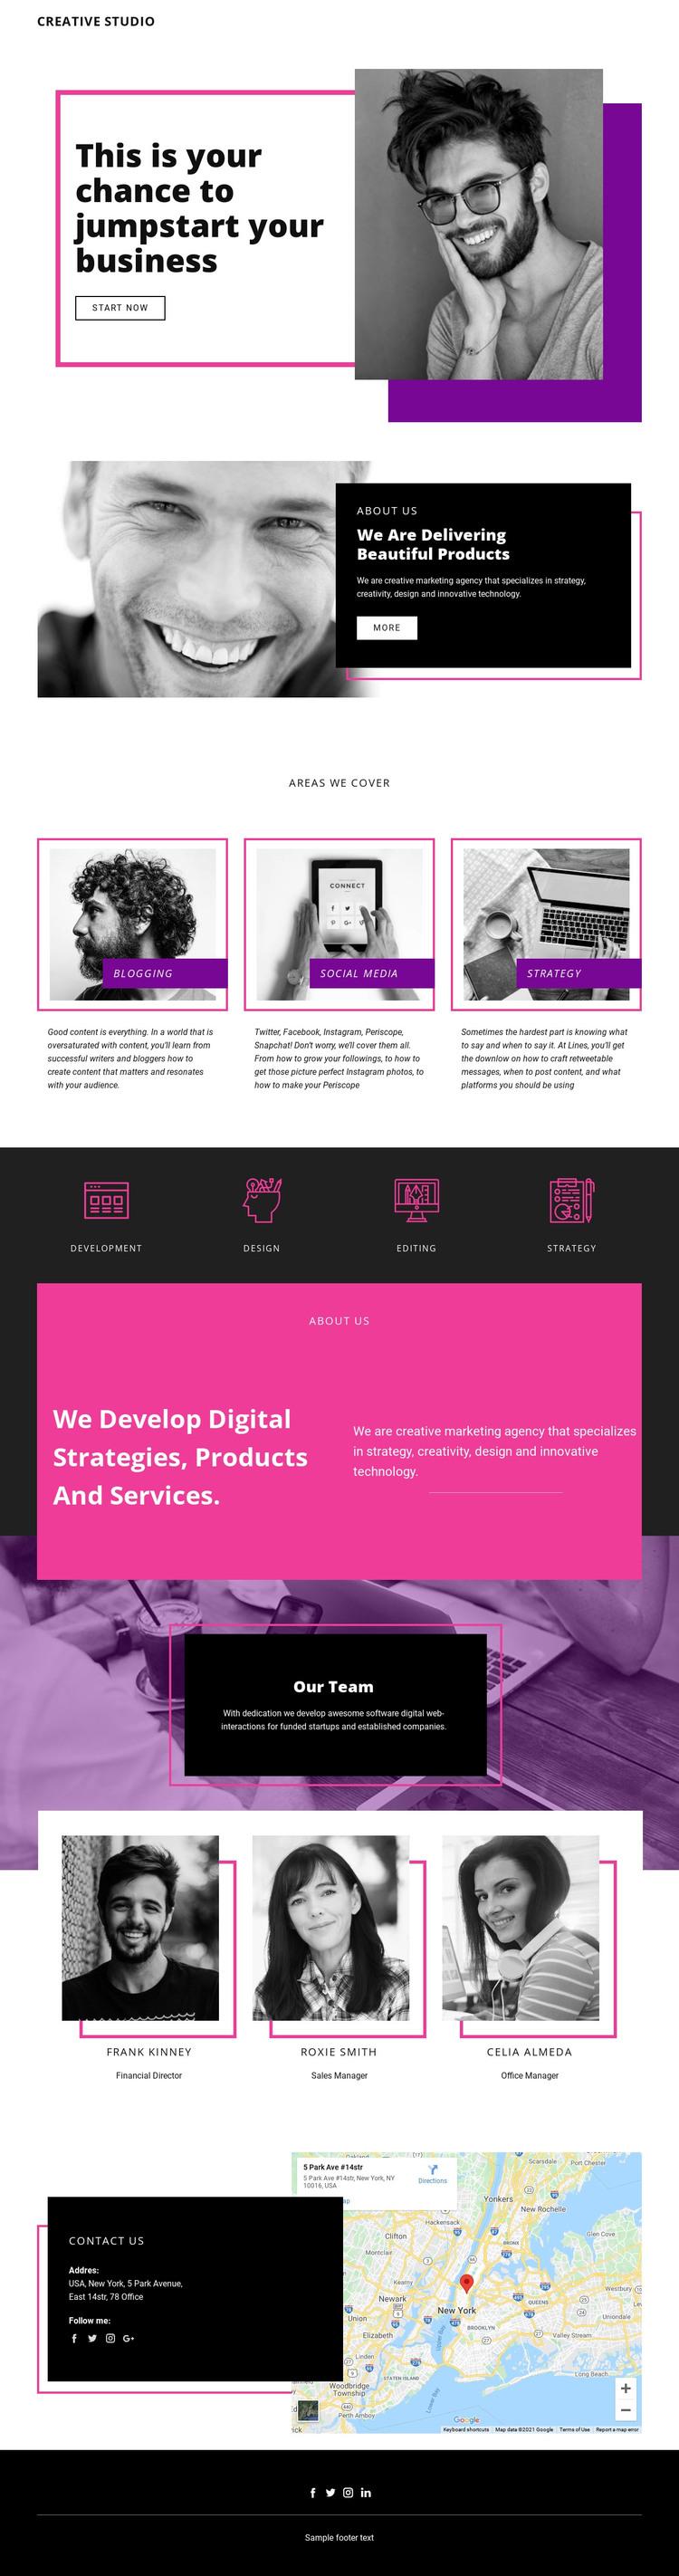 Digital Studio Web Design